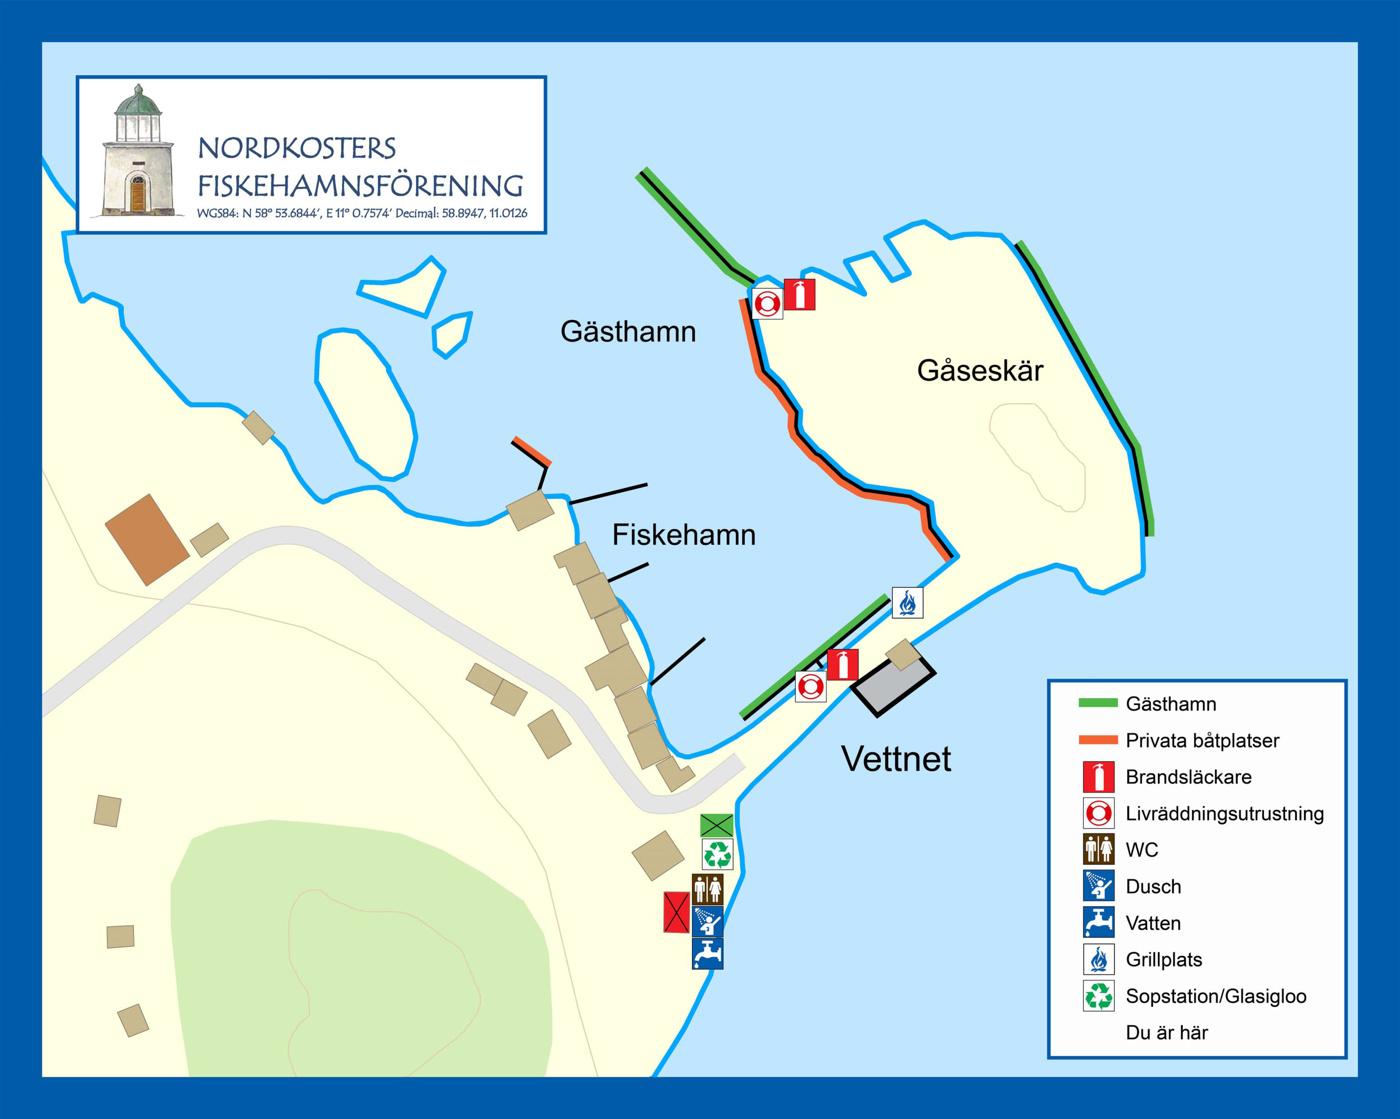 Vettnet Nordkosters Fiskehamnsförening